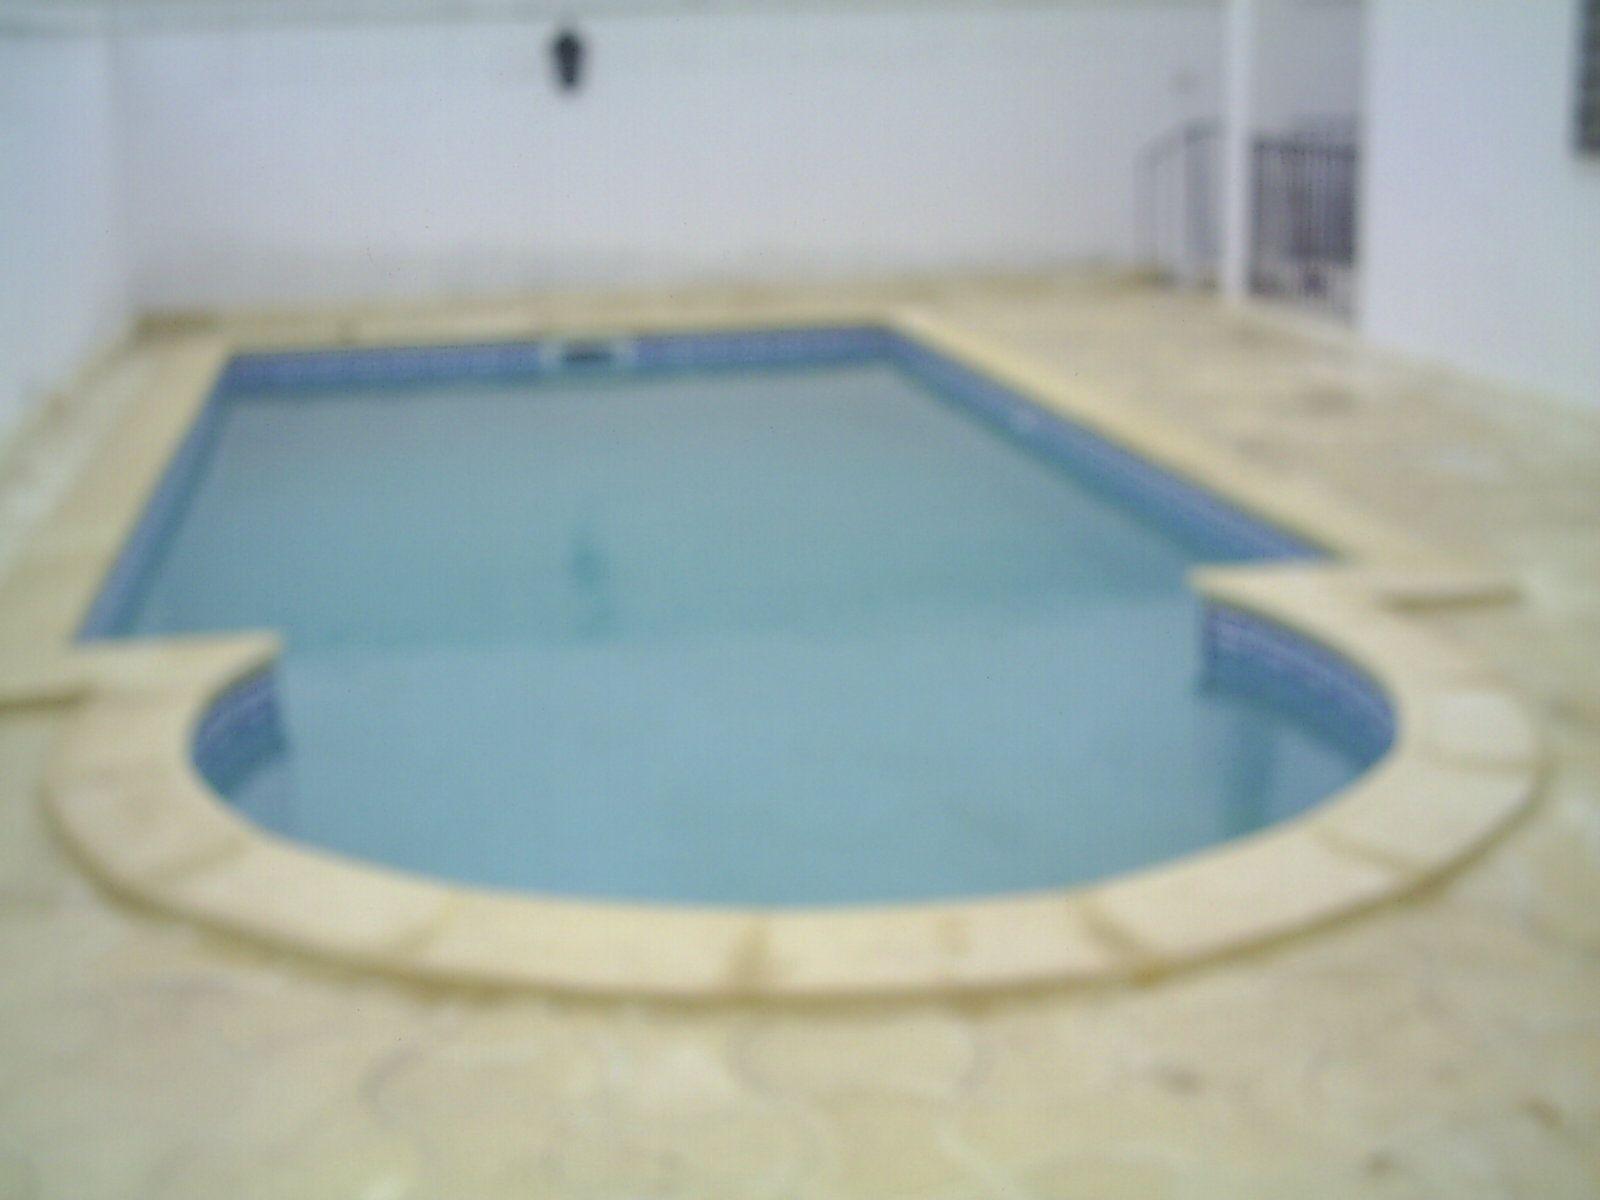 Villa youcefréf:  villa avec piscine